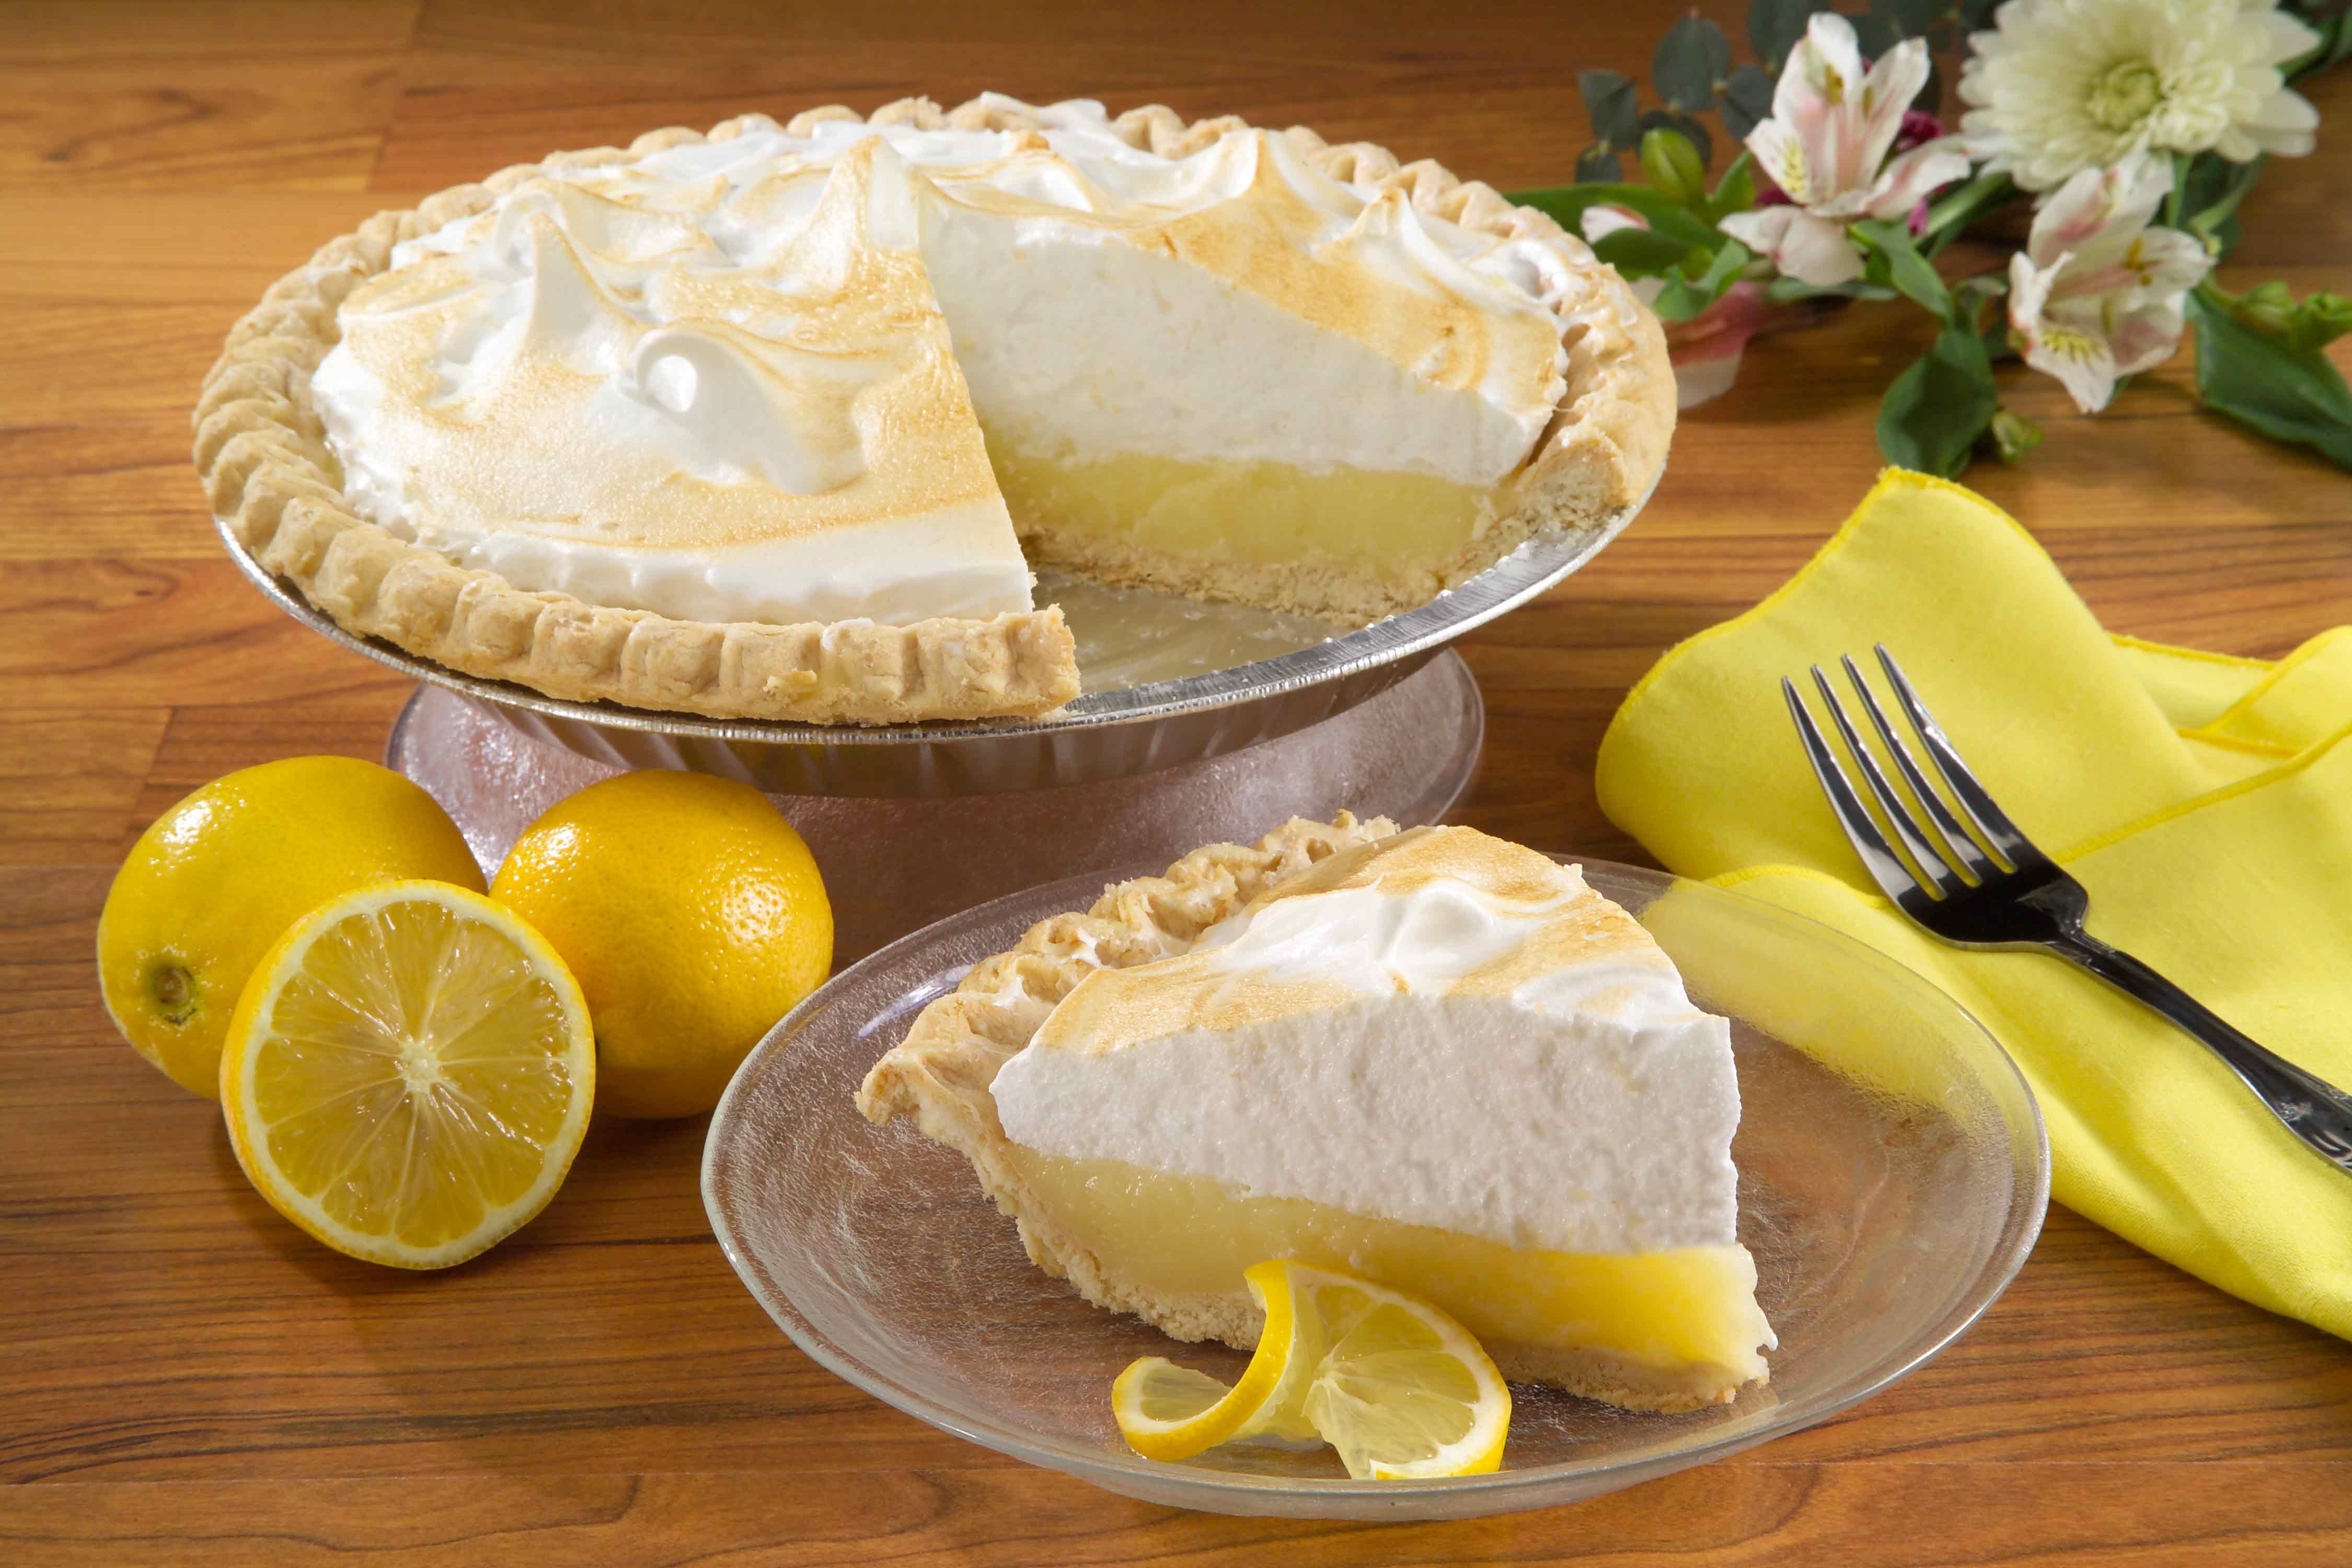 Lemon Meringue Pie 4k Ultra HD Wallpaper Background Image 4500x3000